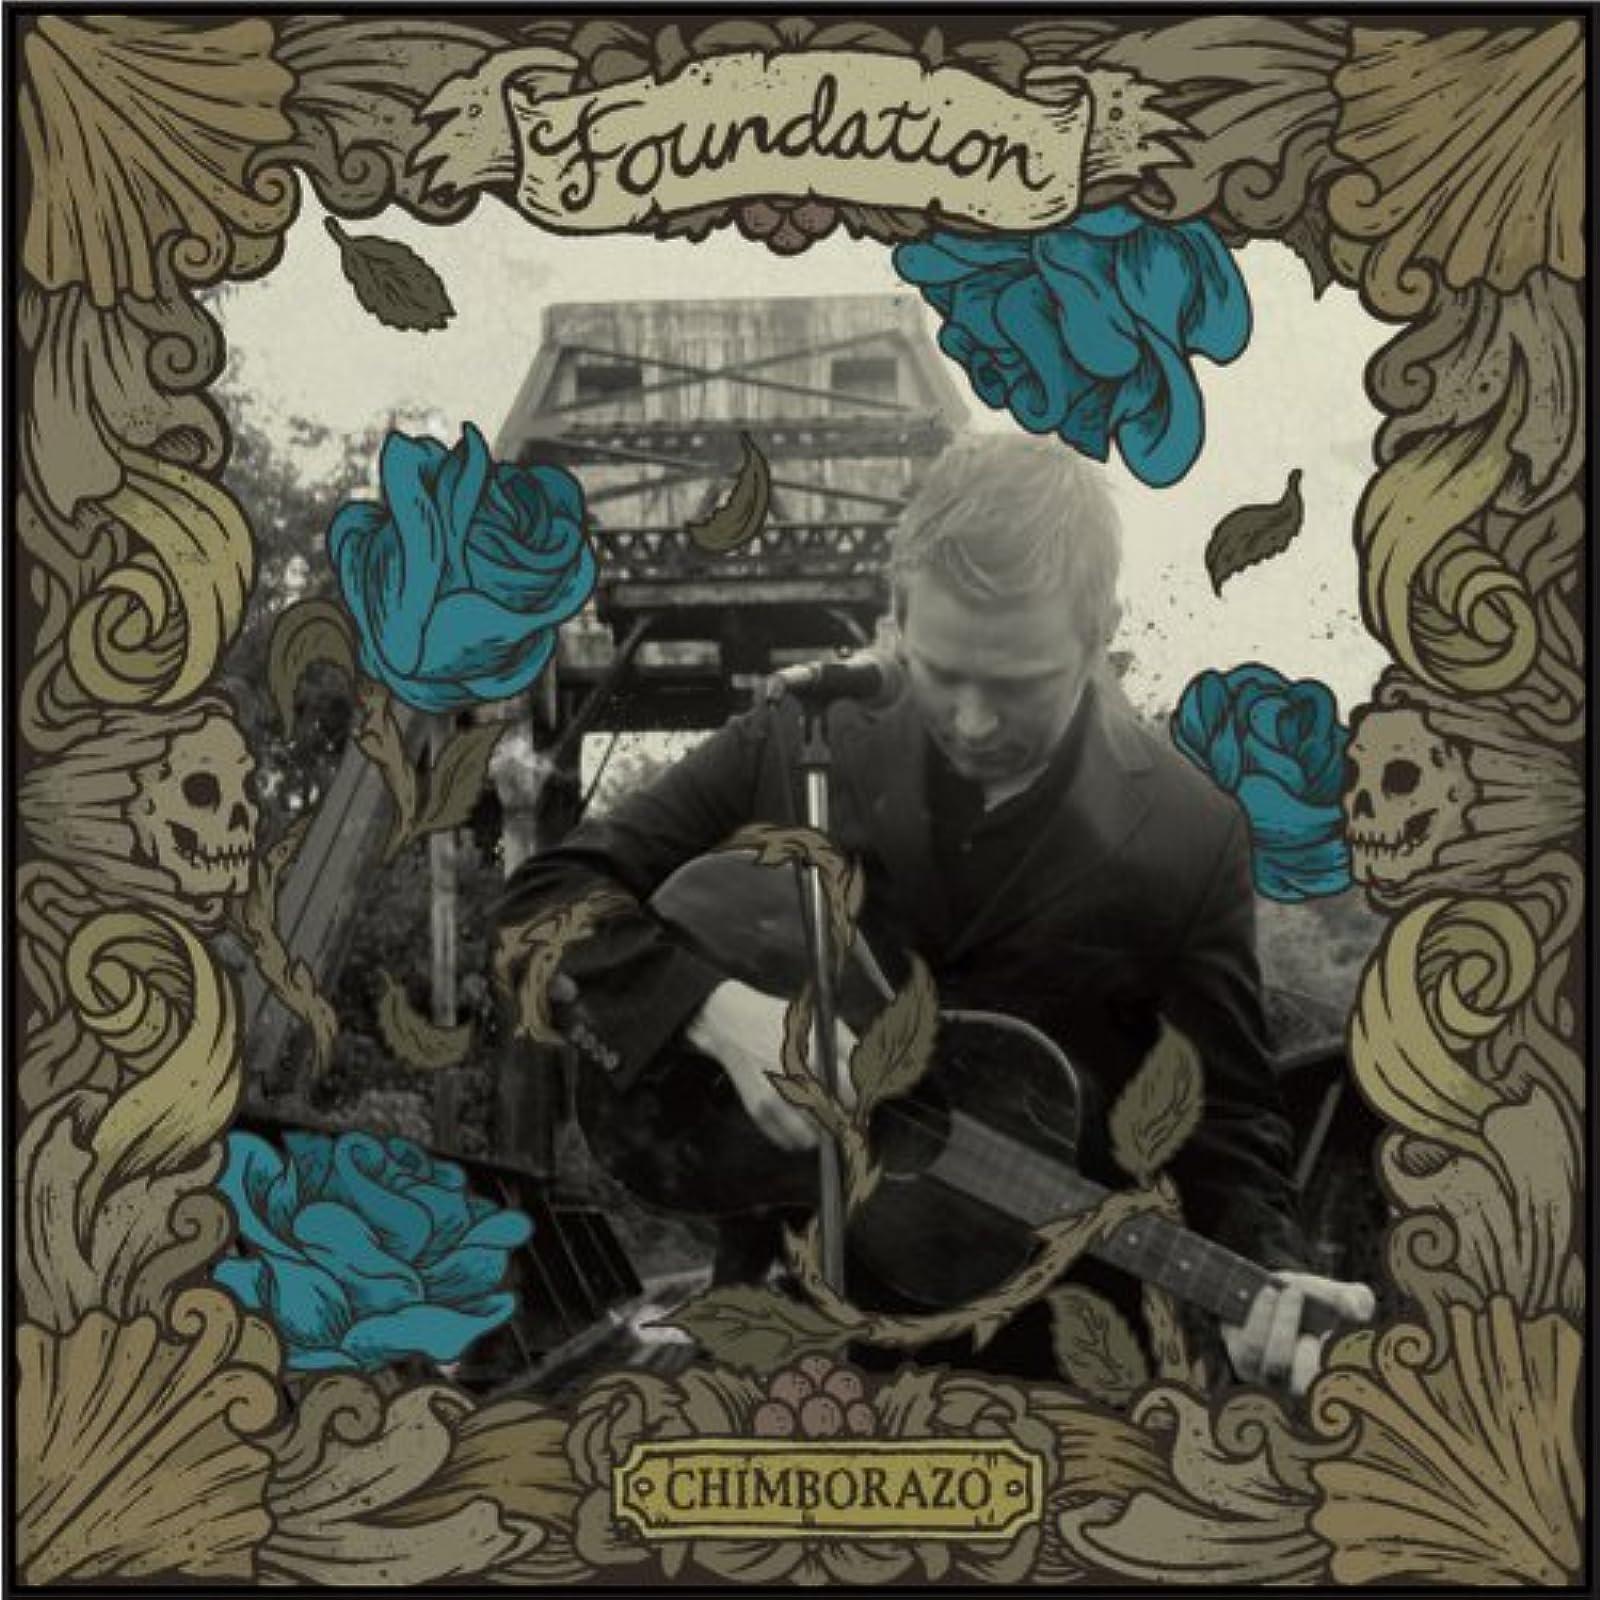 Chimborazo On Vinyl Record Import By Foundation